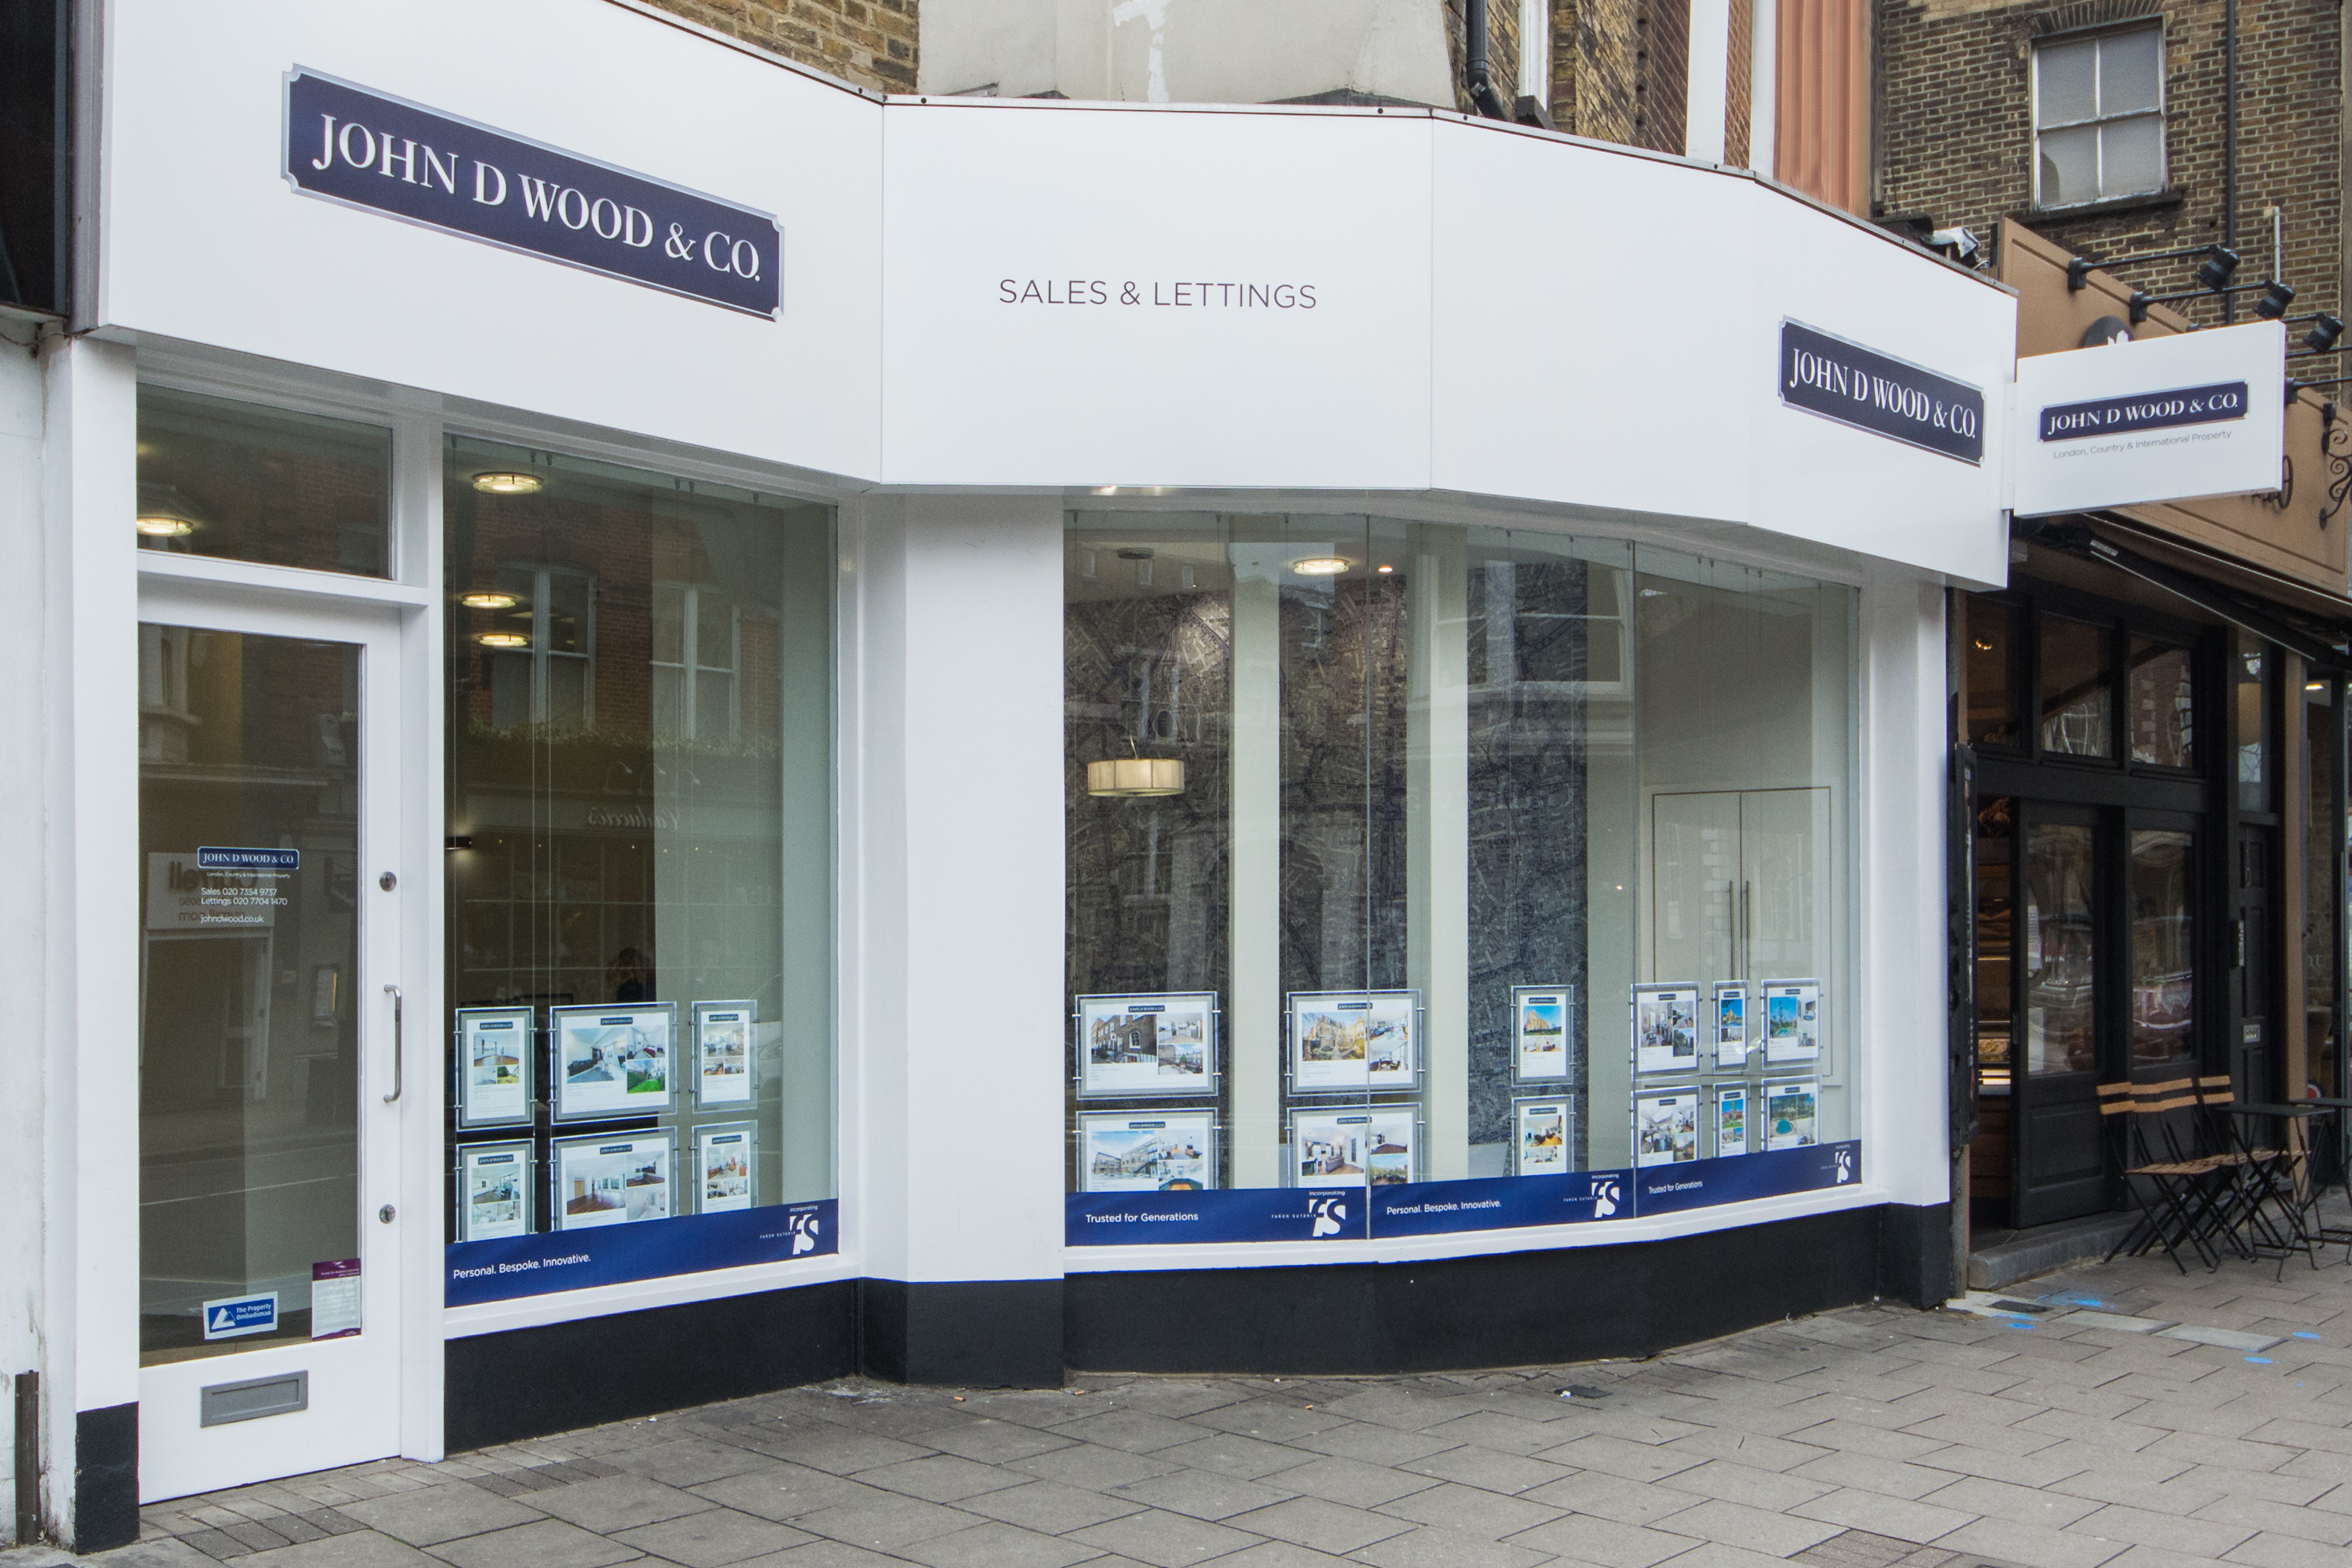 John D Wood & Co Estate Agents 108-109 Upper St, London, United Kingdom